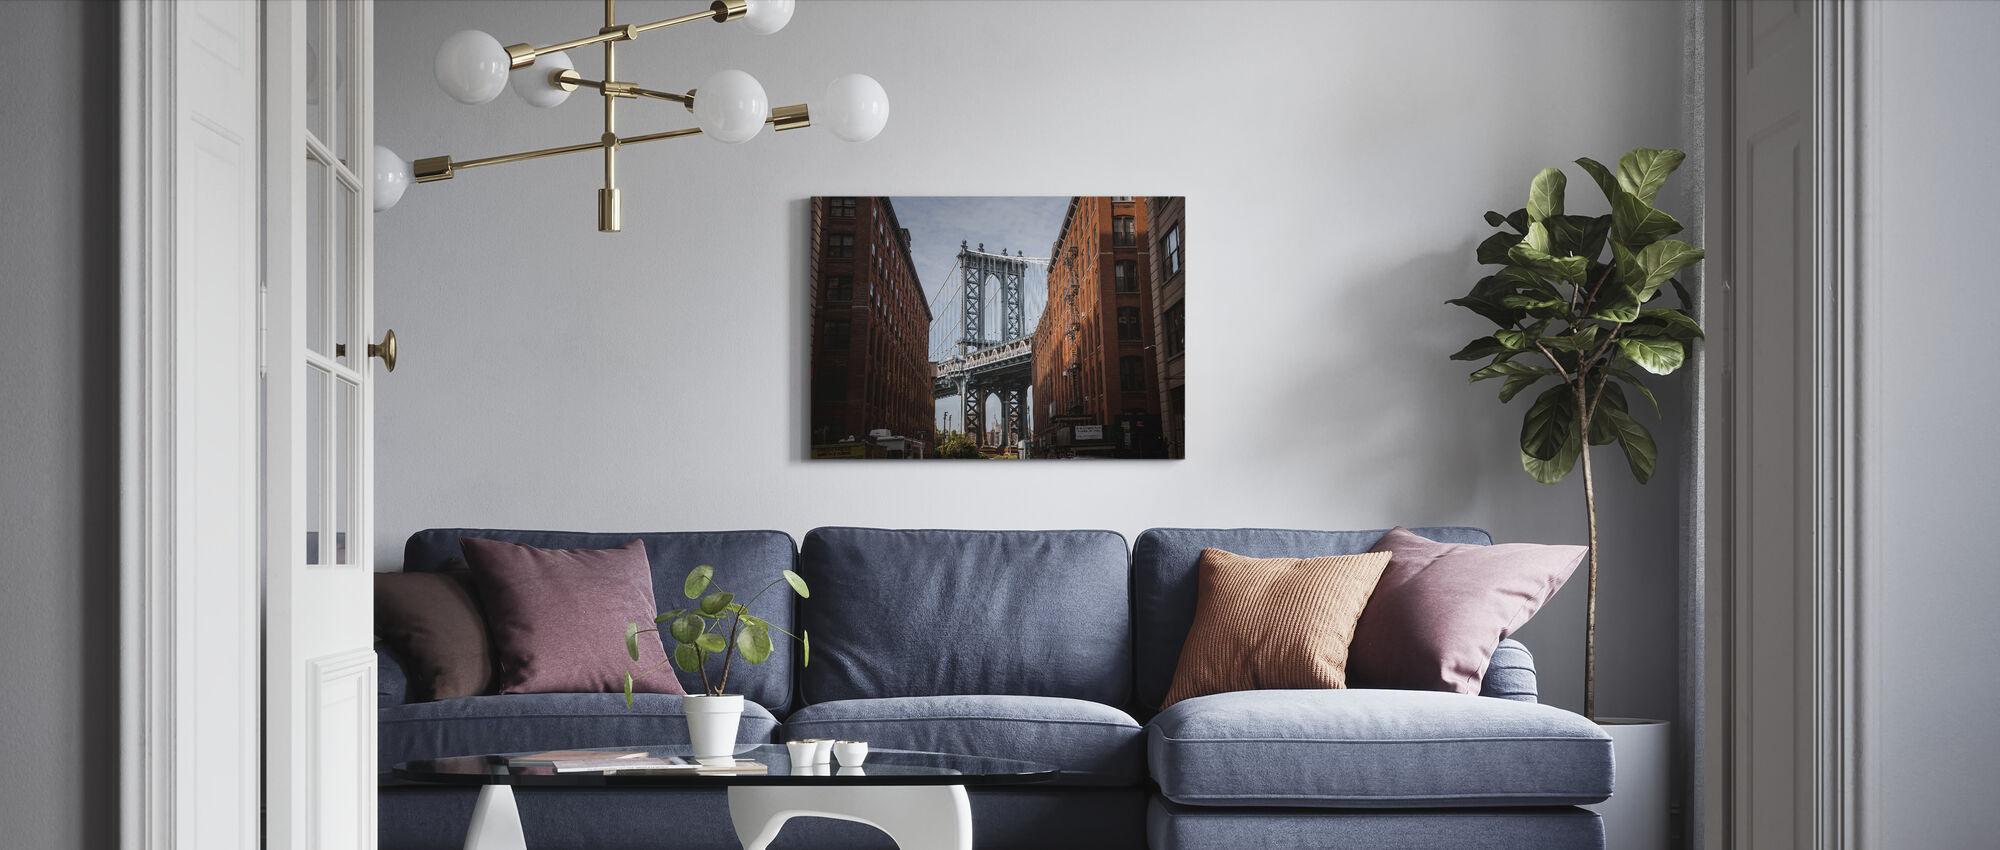 Brooklyn Bridge View - Canvas print - Living Room